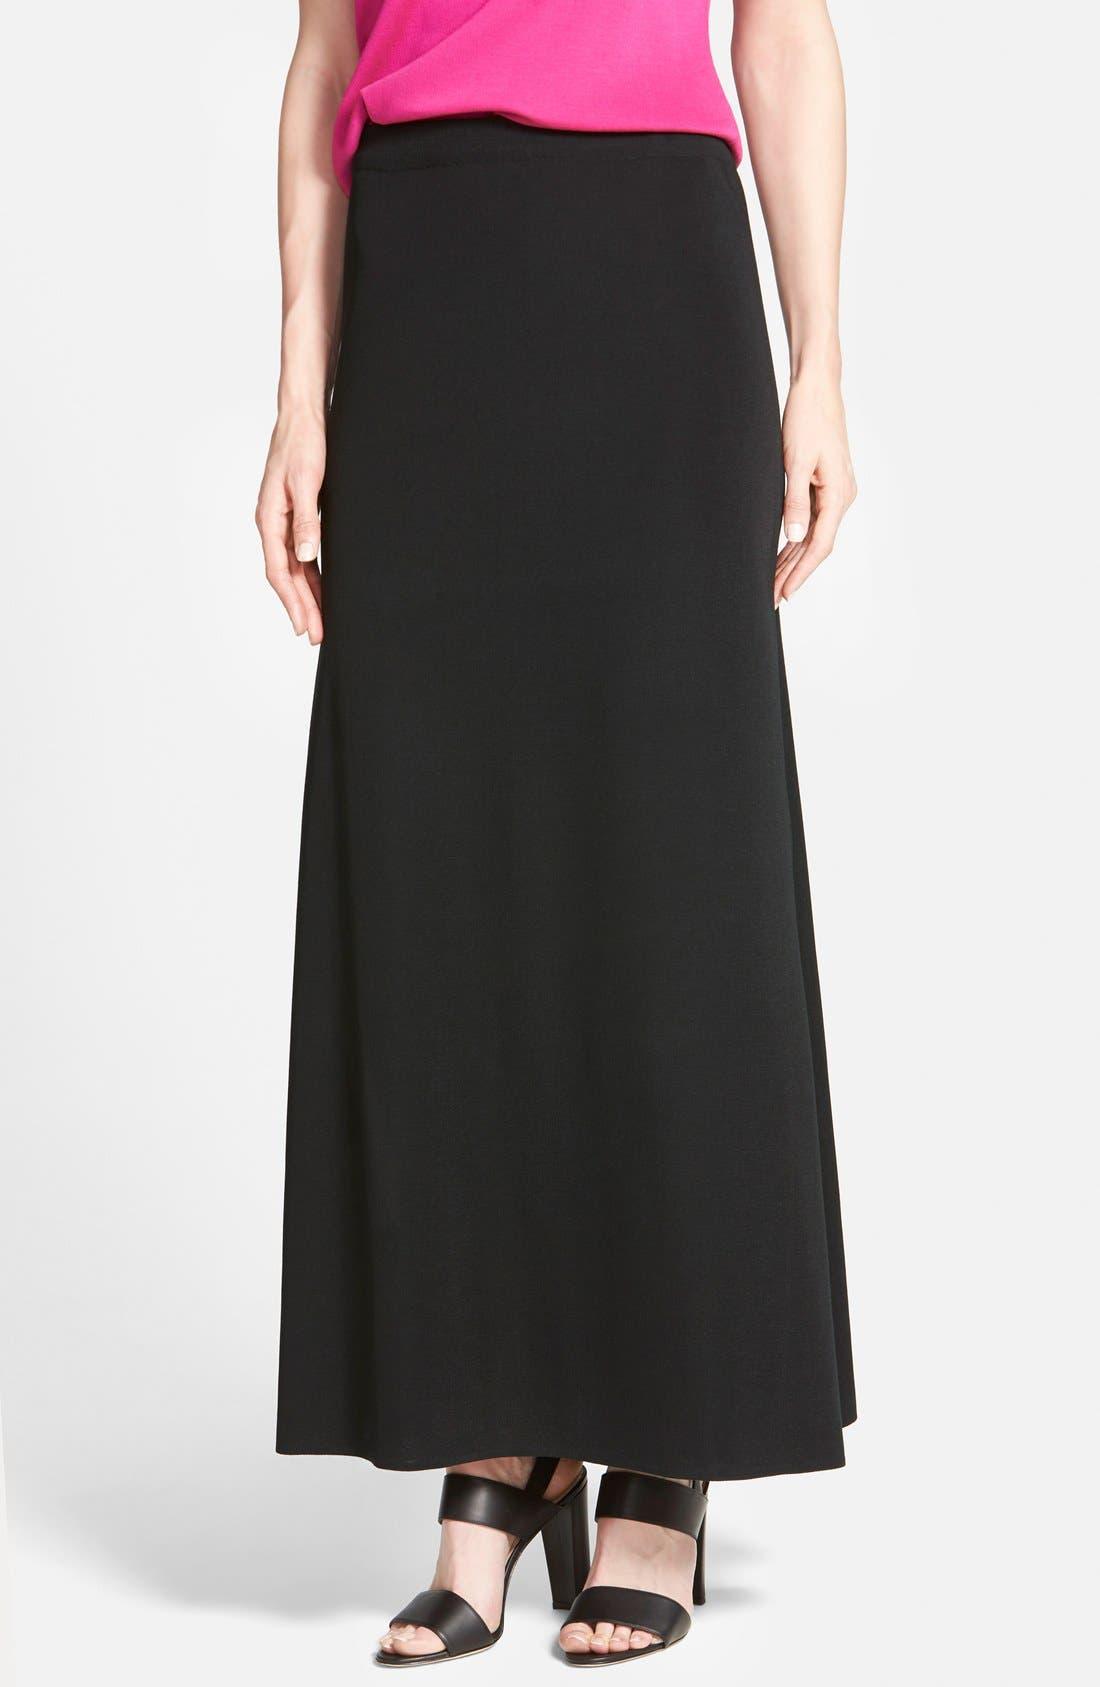 MING WANG A-Line Knit Maxi Skirt, Main, color, BLACK